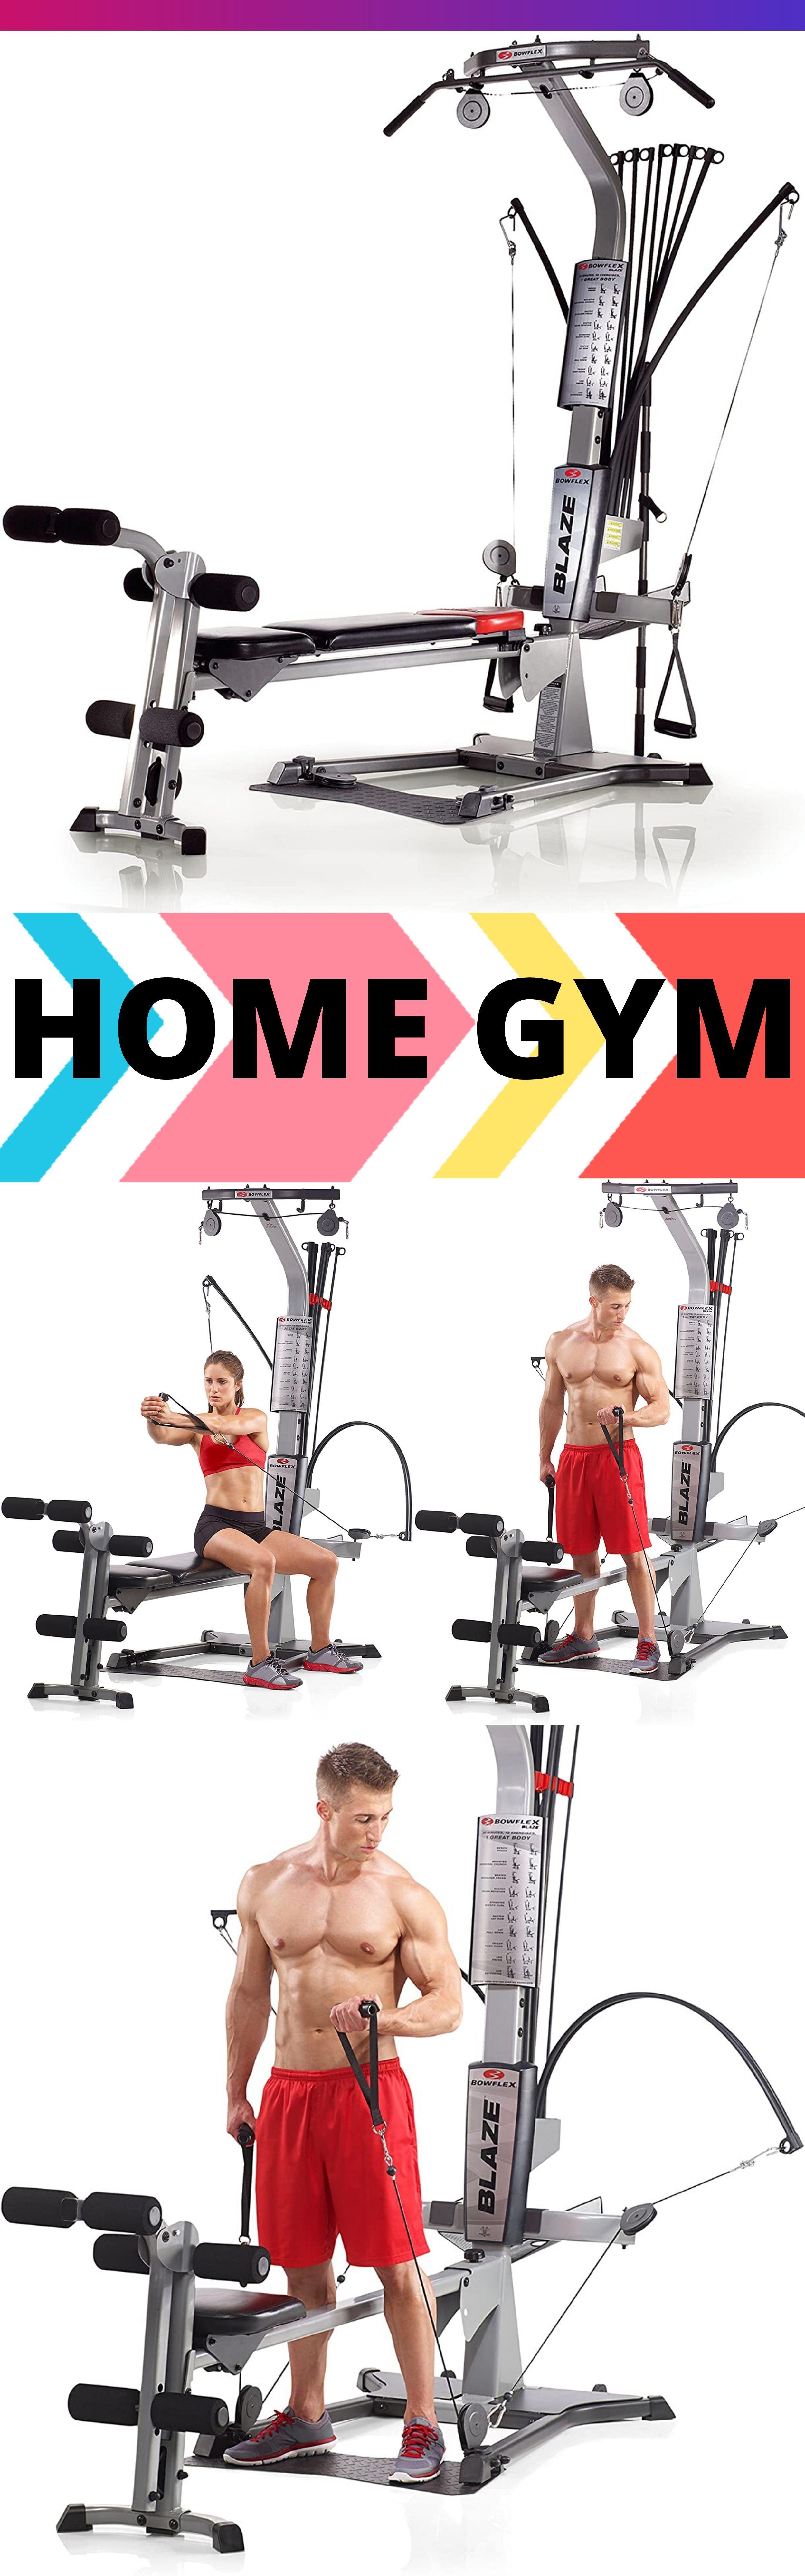 Bowflex Home Gym Series Home Gym Bowflex Bowflex Blaze